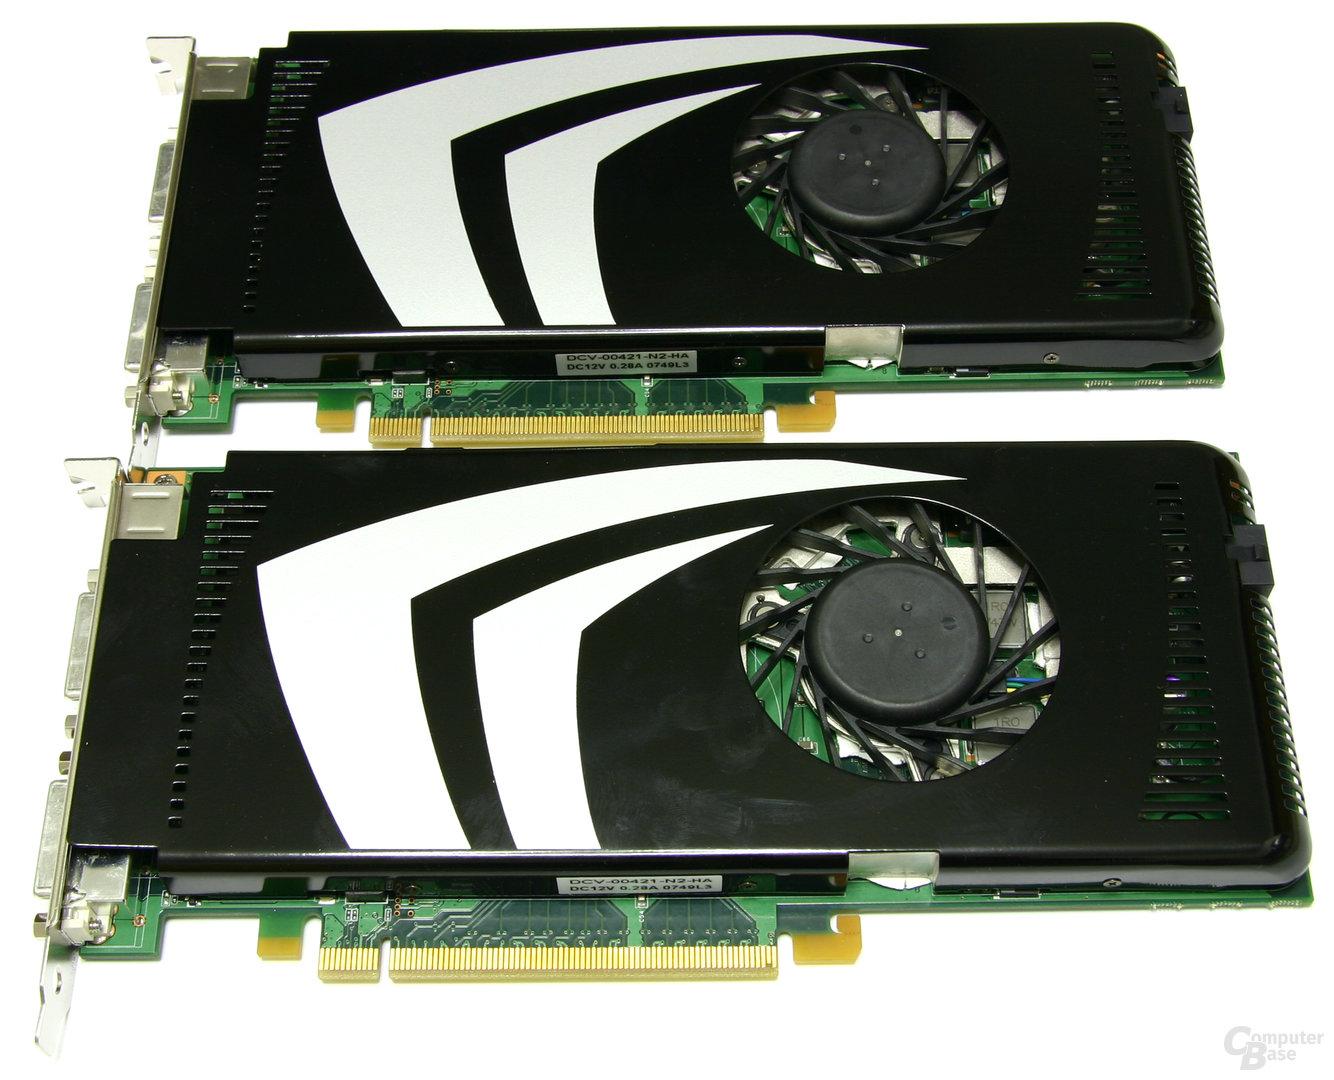 Nvidia GeForce 9600 GT SLI